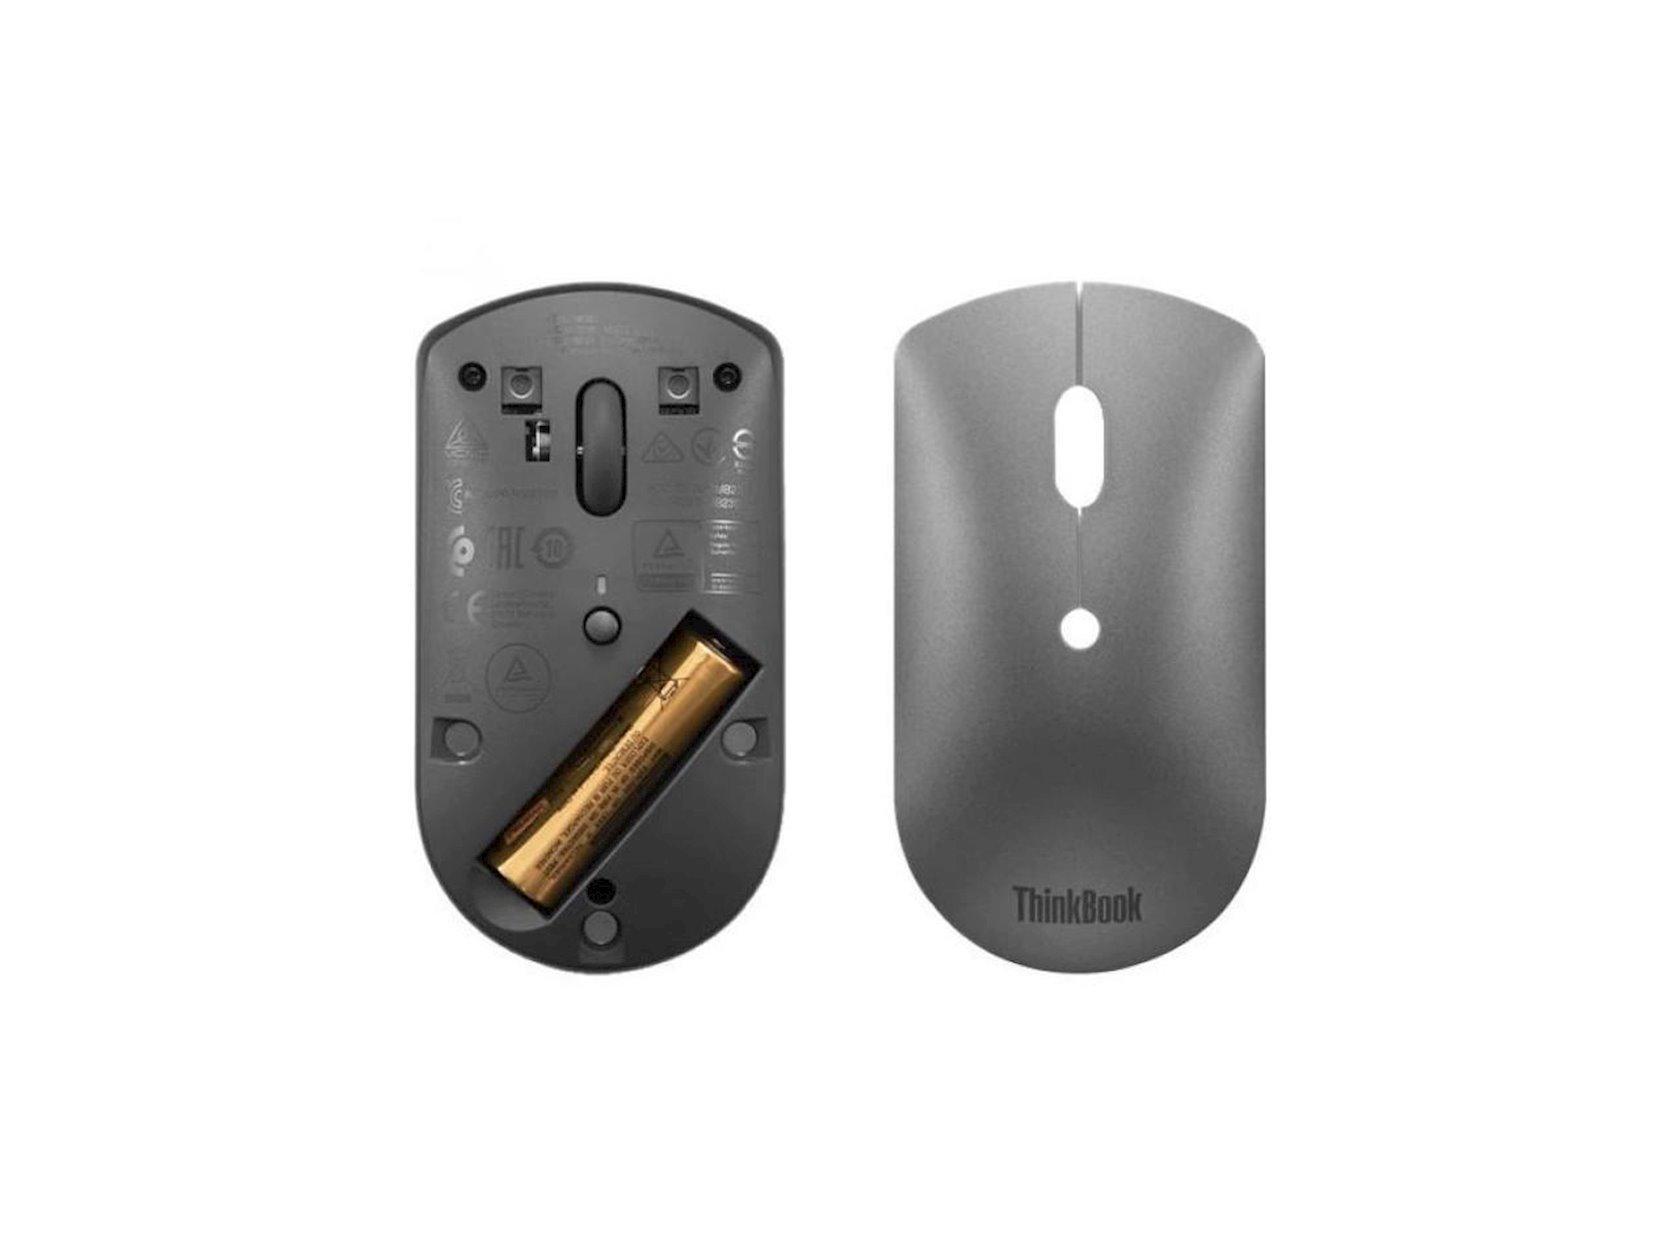 Kompüter siçanı Lenovo Thinkbook BT Silent Mouse Grey